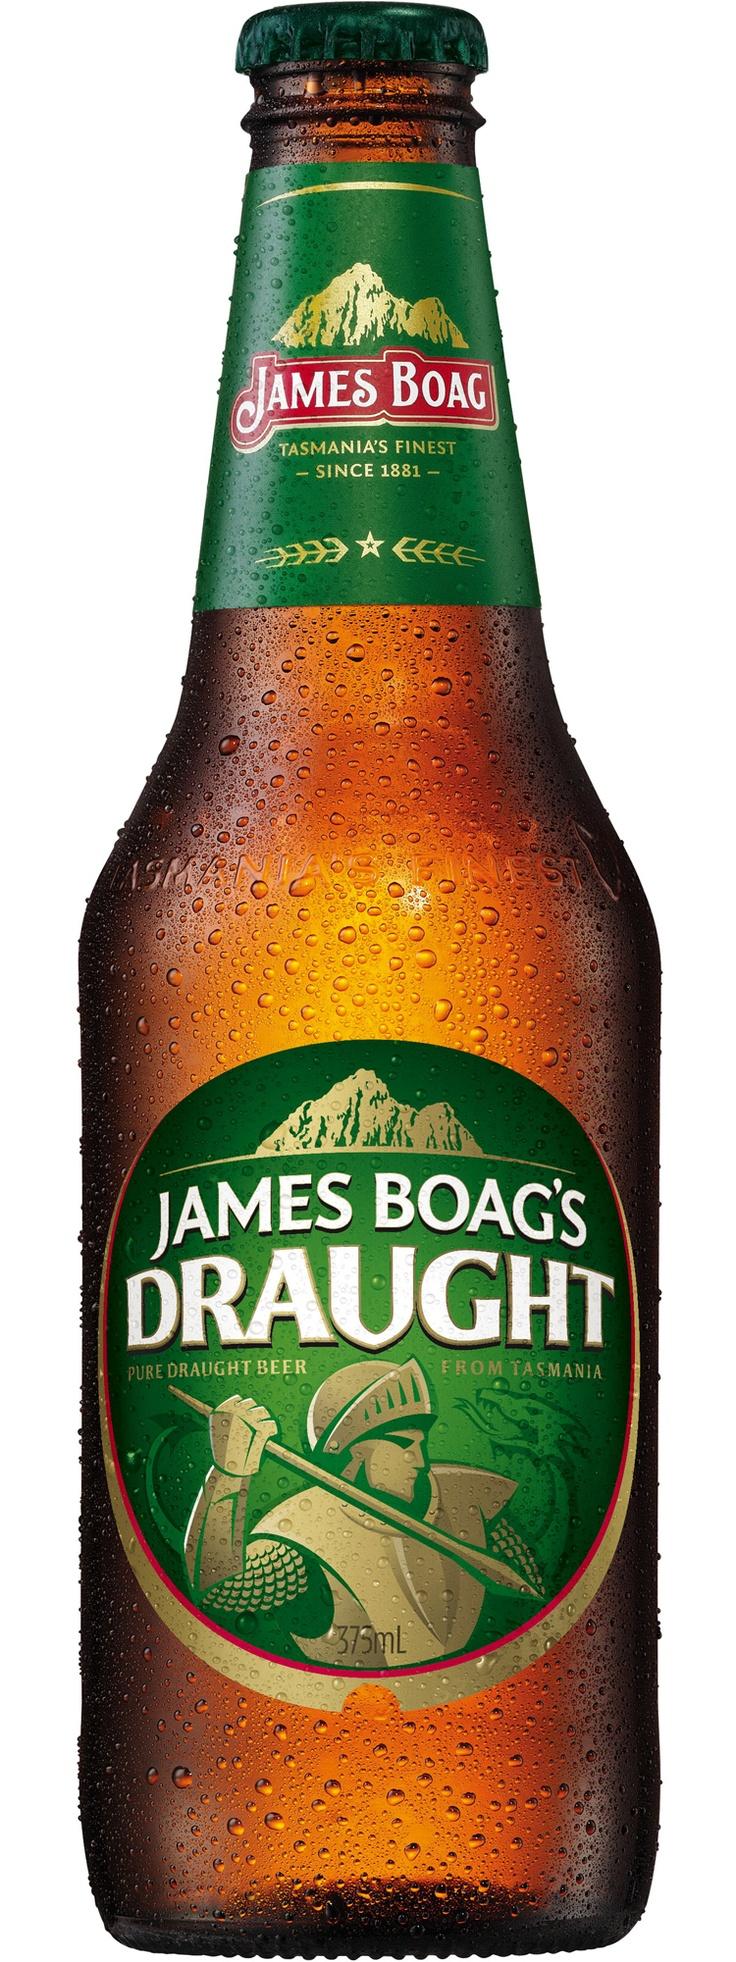 James Boag's Draught